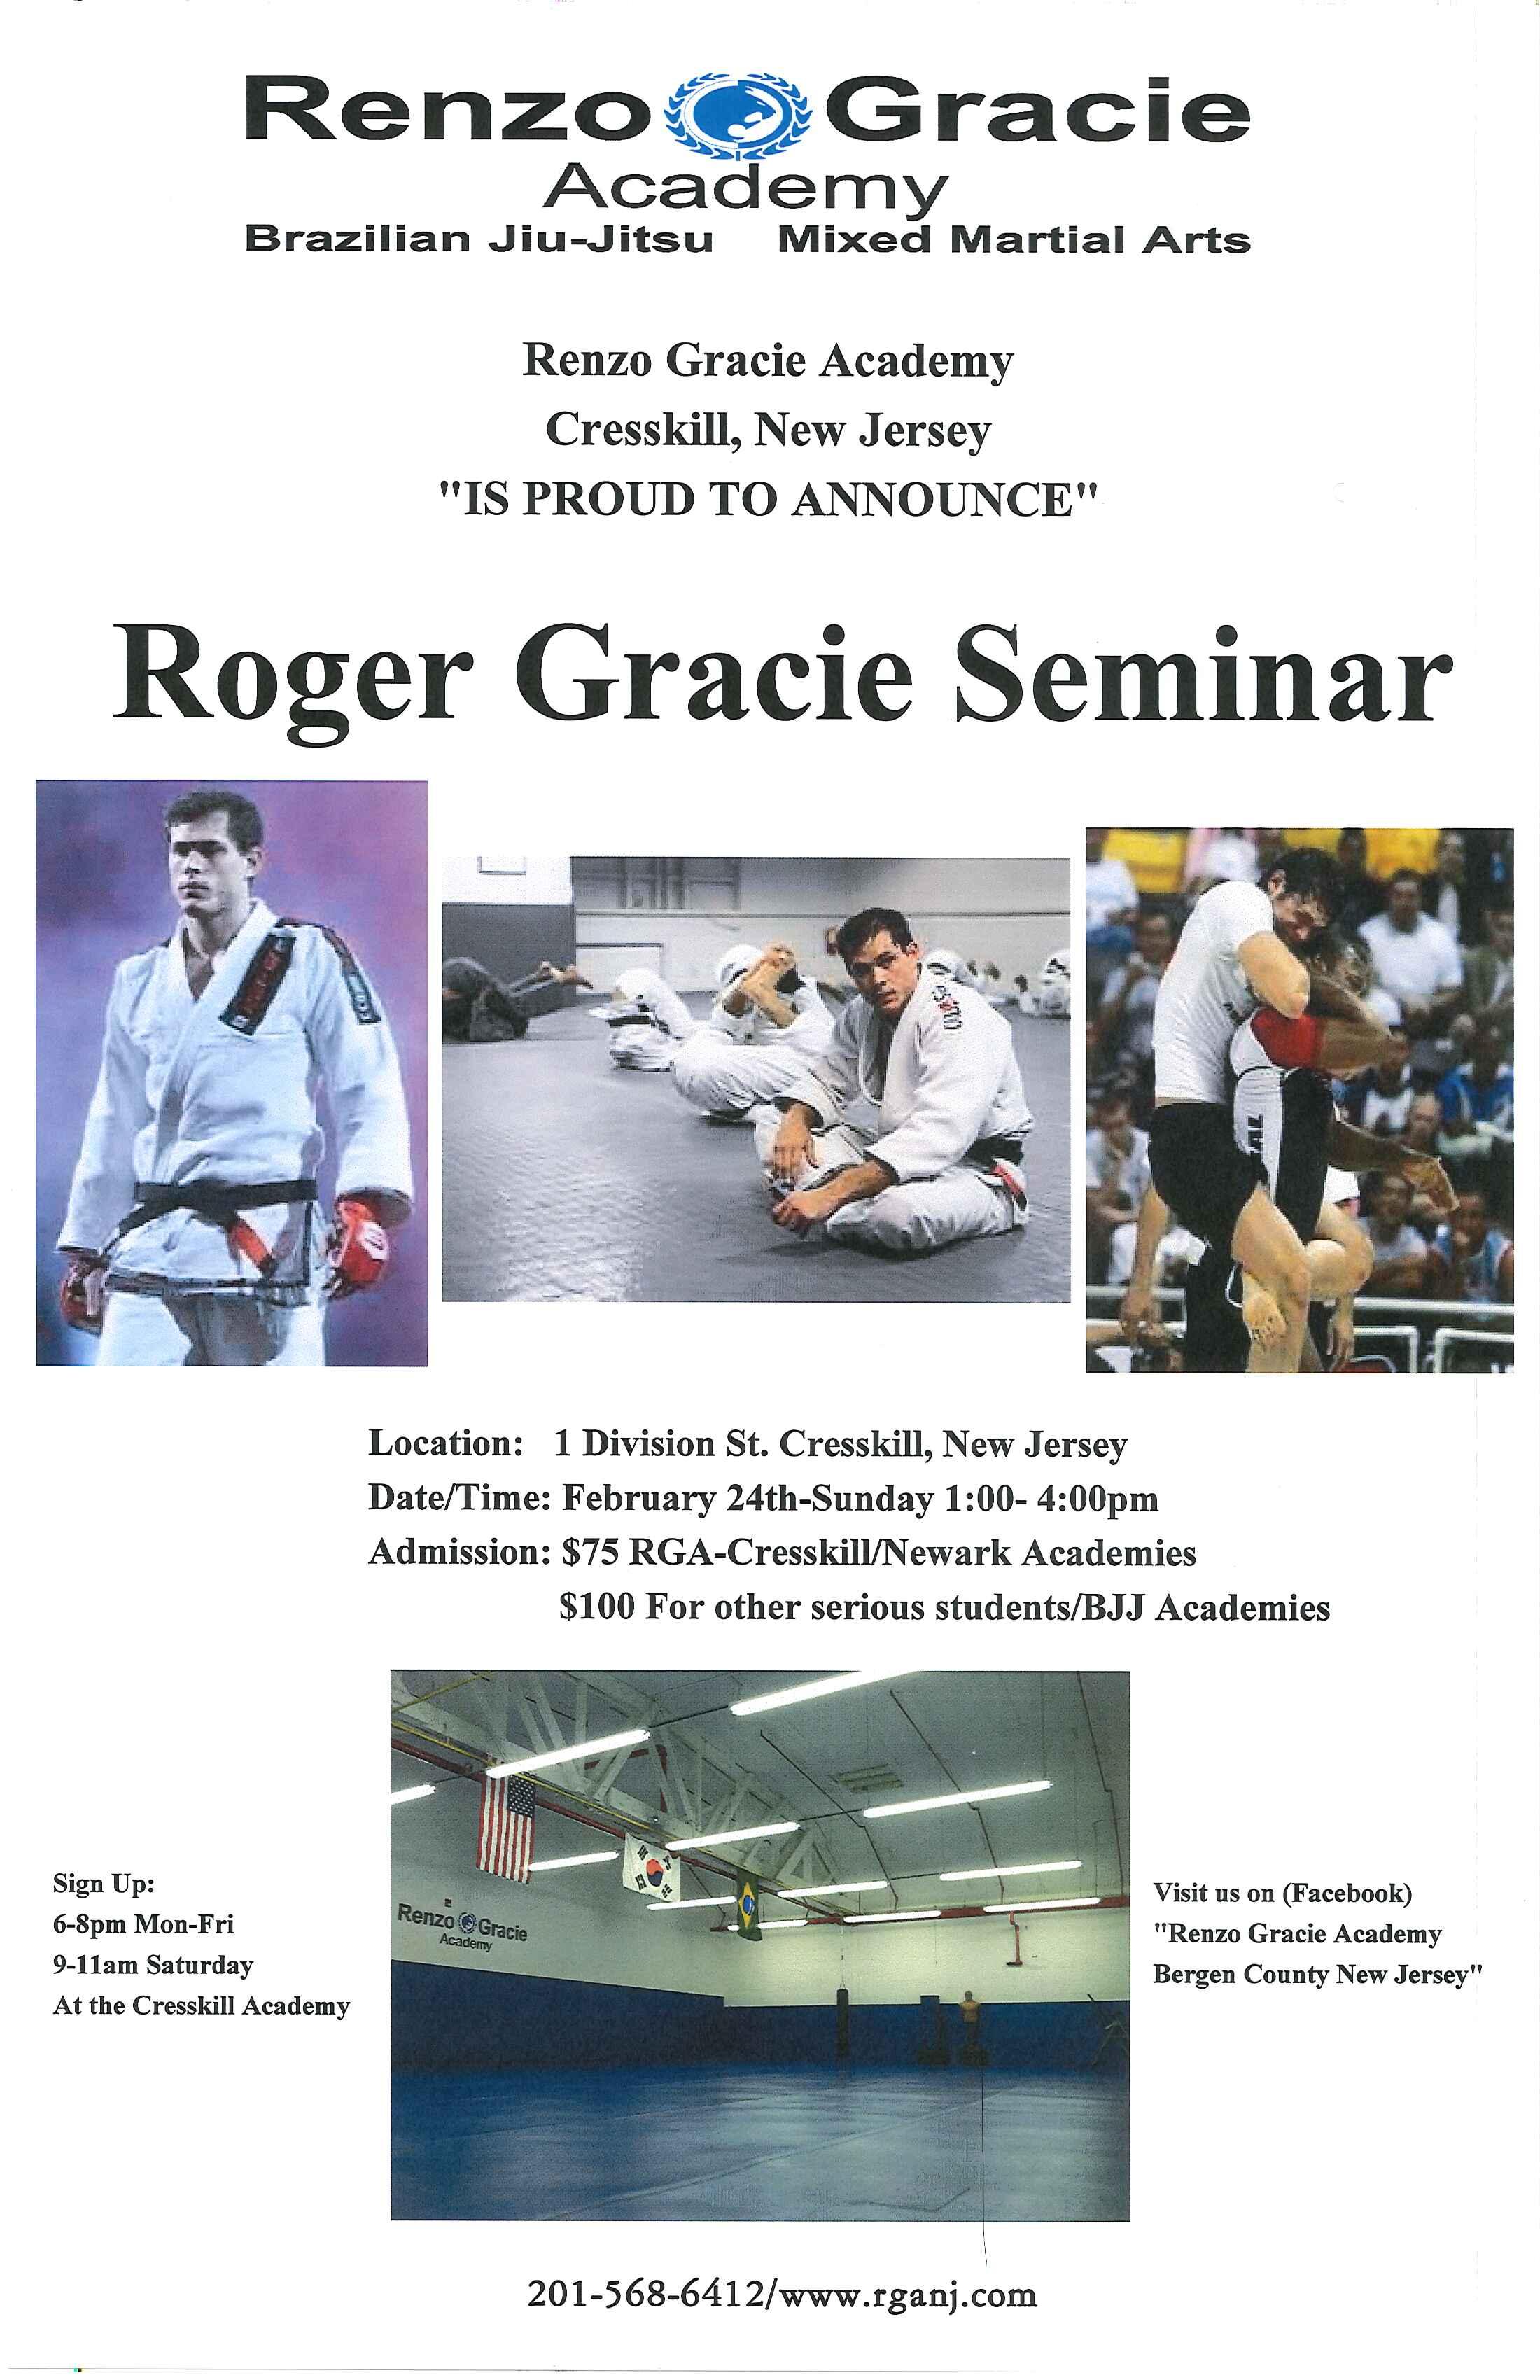 Roger Gracie Seminar in Renzo Gracie Cresskill